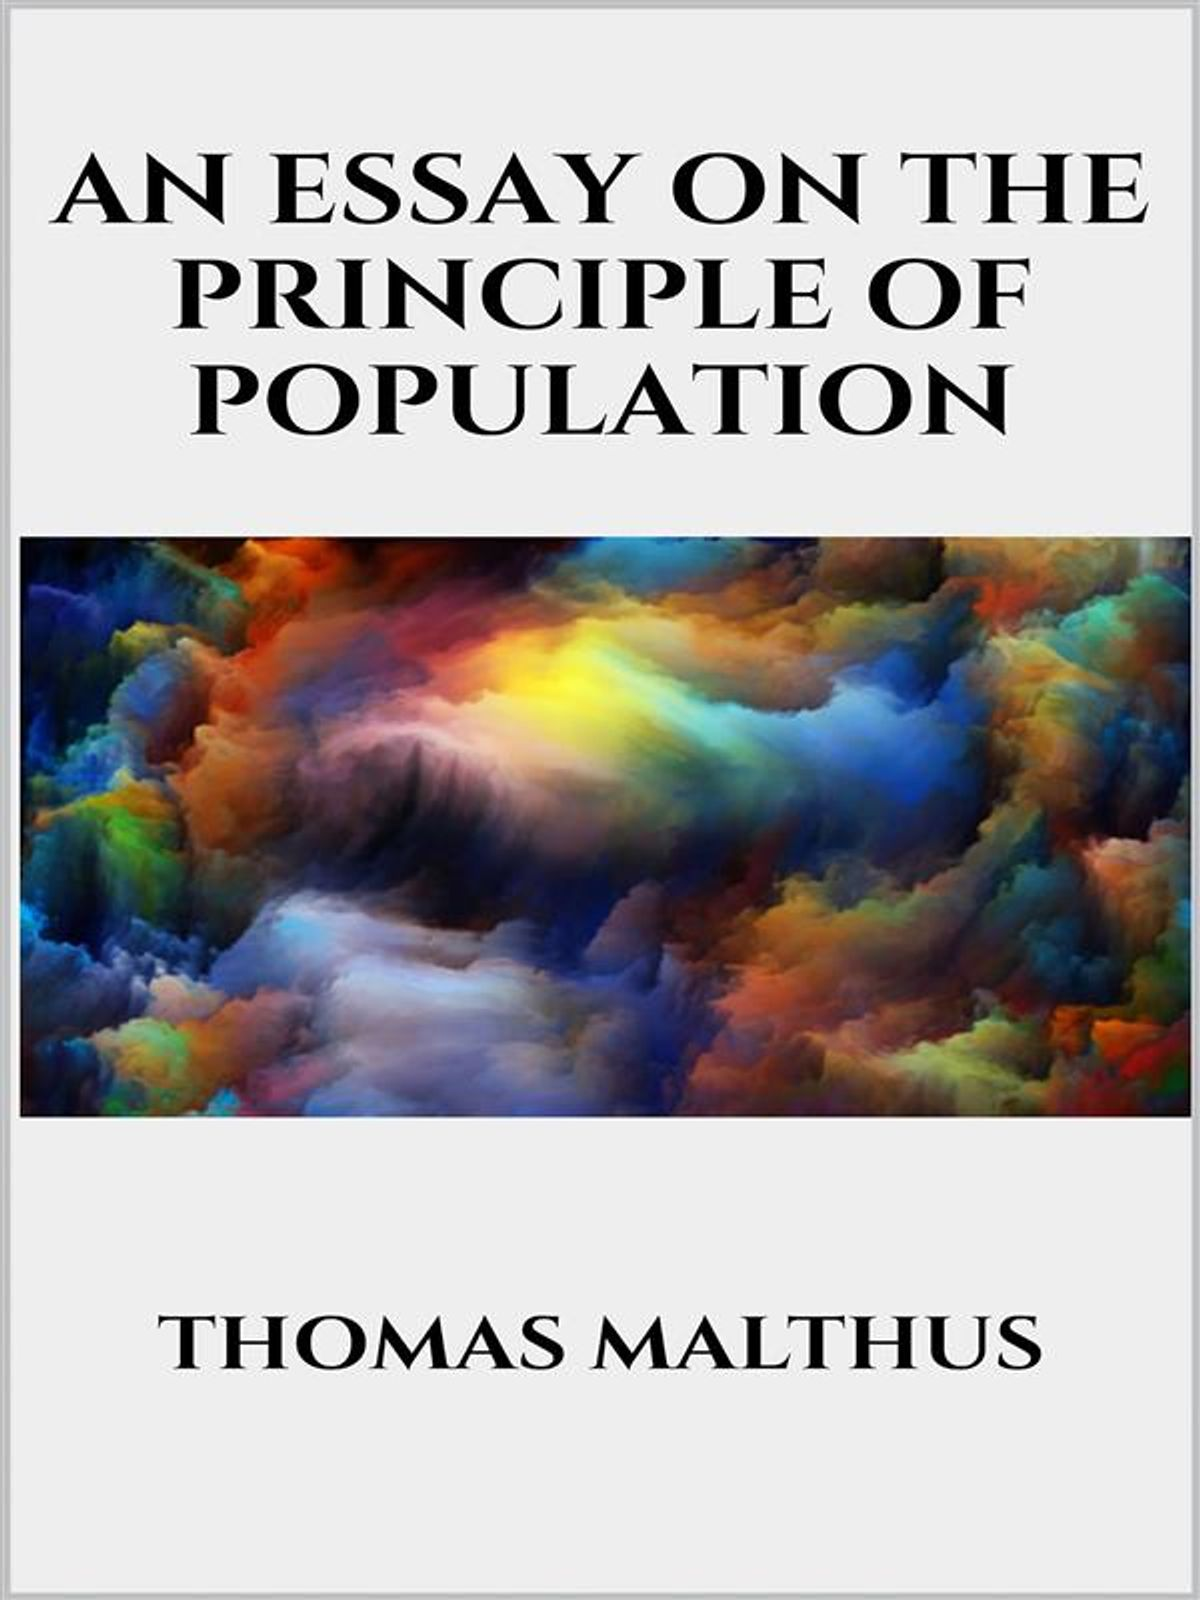 016 Thomas Malthus Essay On The Principle Of Population An Stupendous After Reading Malthus's Principles Darwin Got Idea That Ap Euro Full